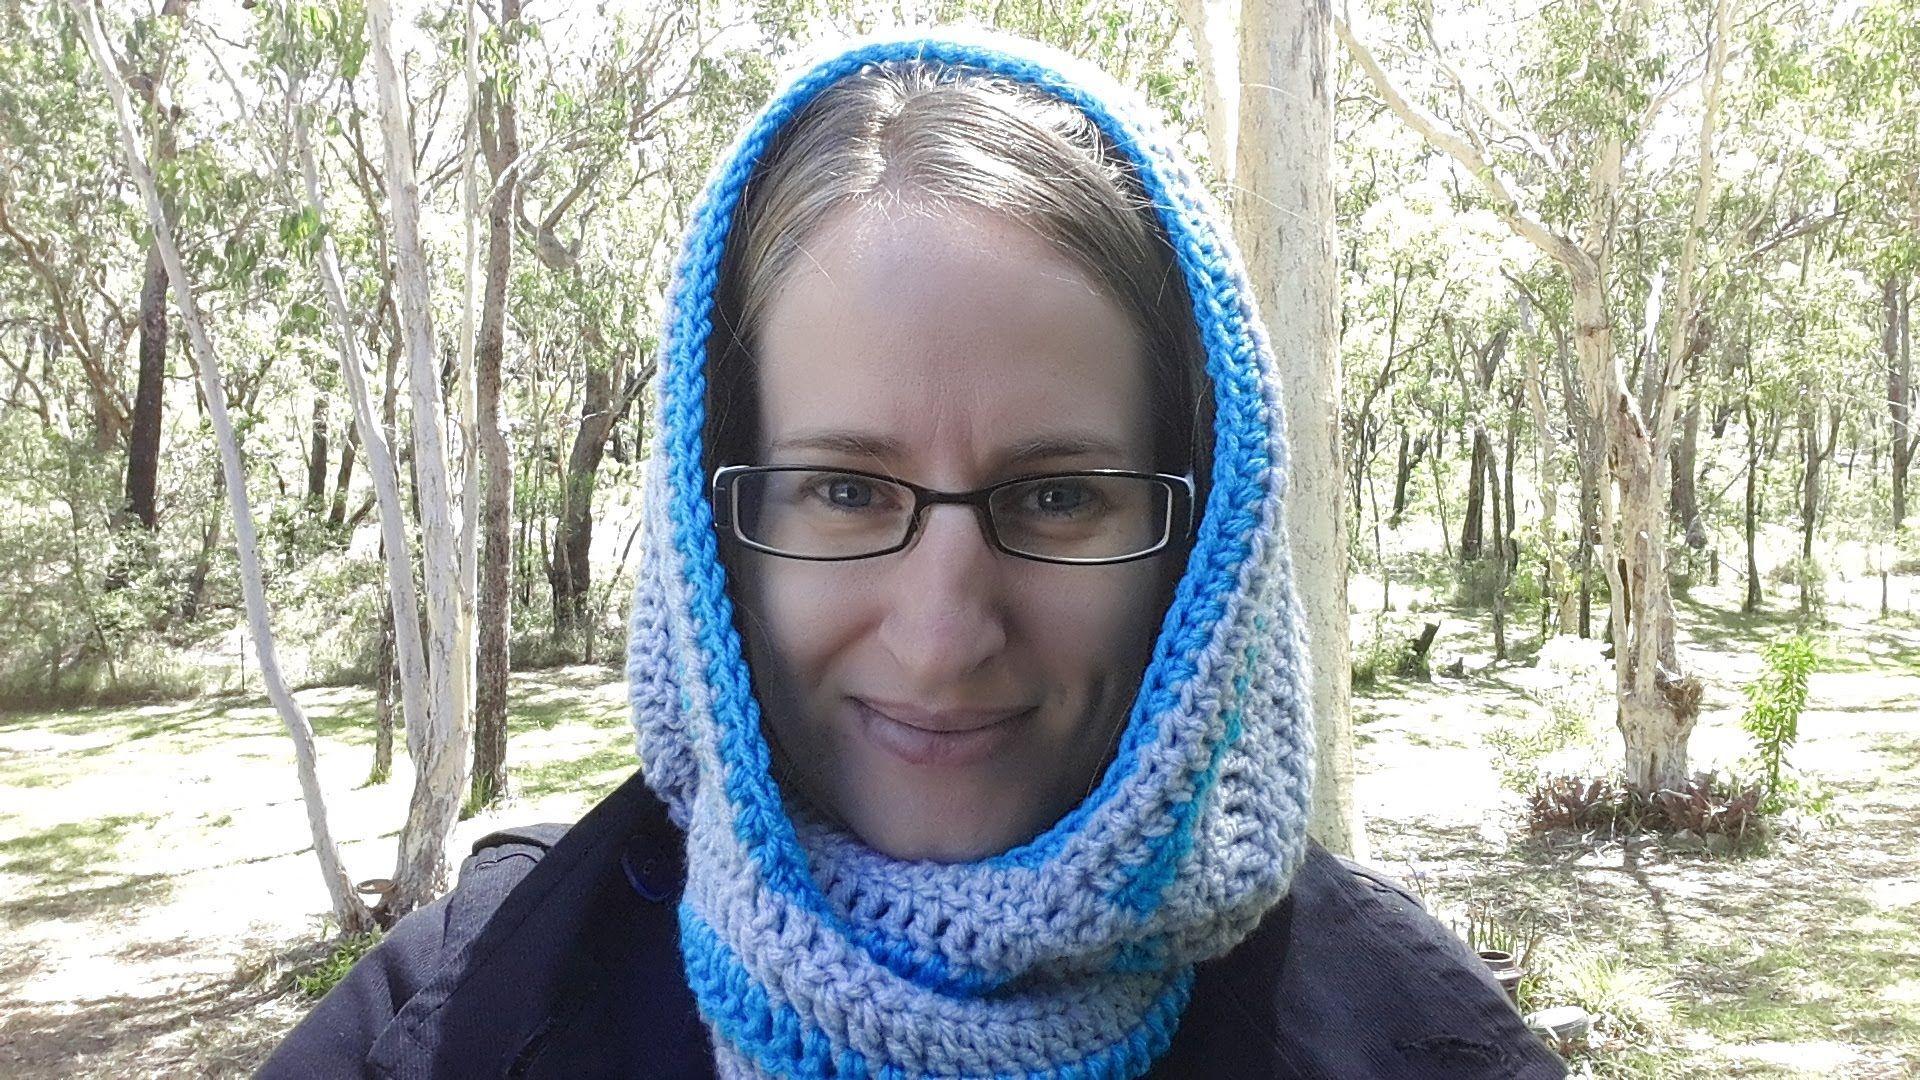 Crochet Scoodie Rounded Hood - with written pattern | Crochet ...